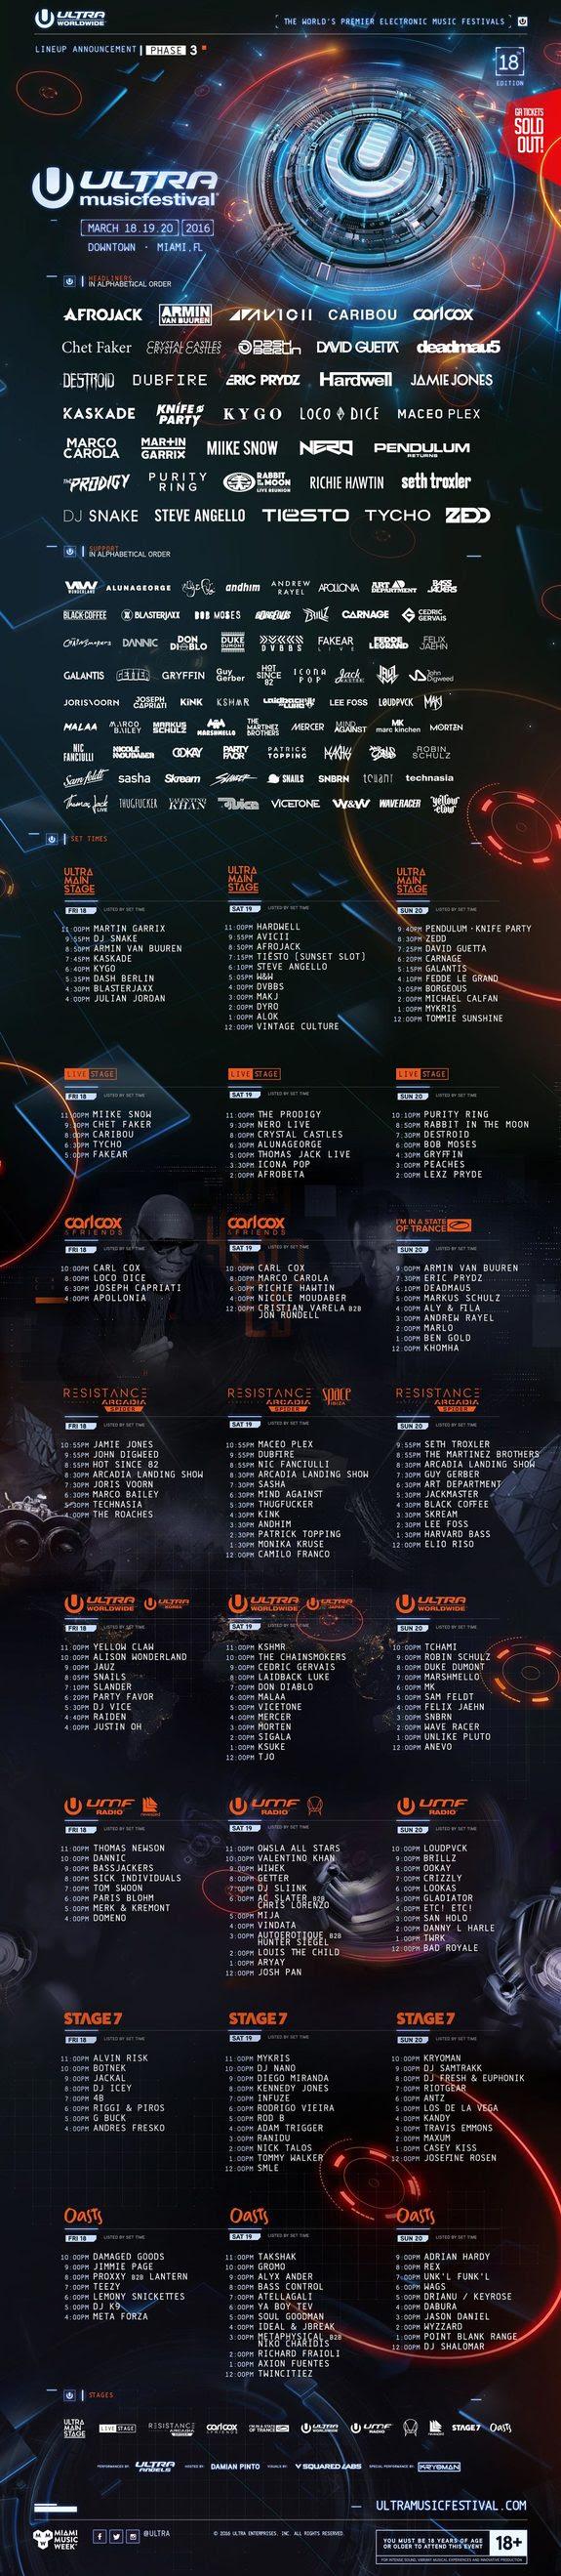 Ultra Music Festival 2016 Lineup